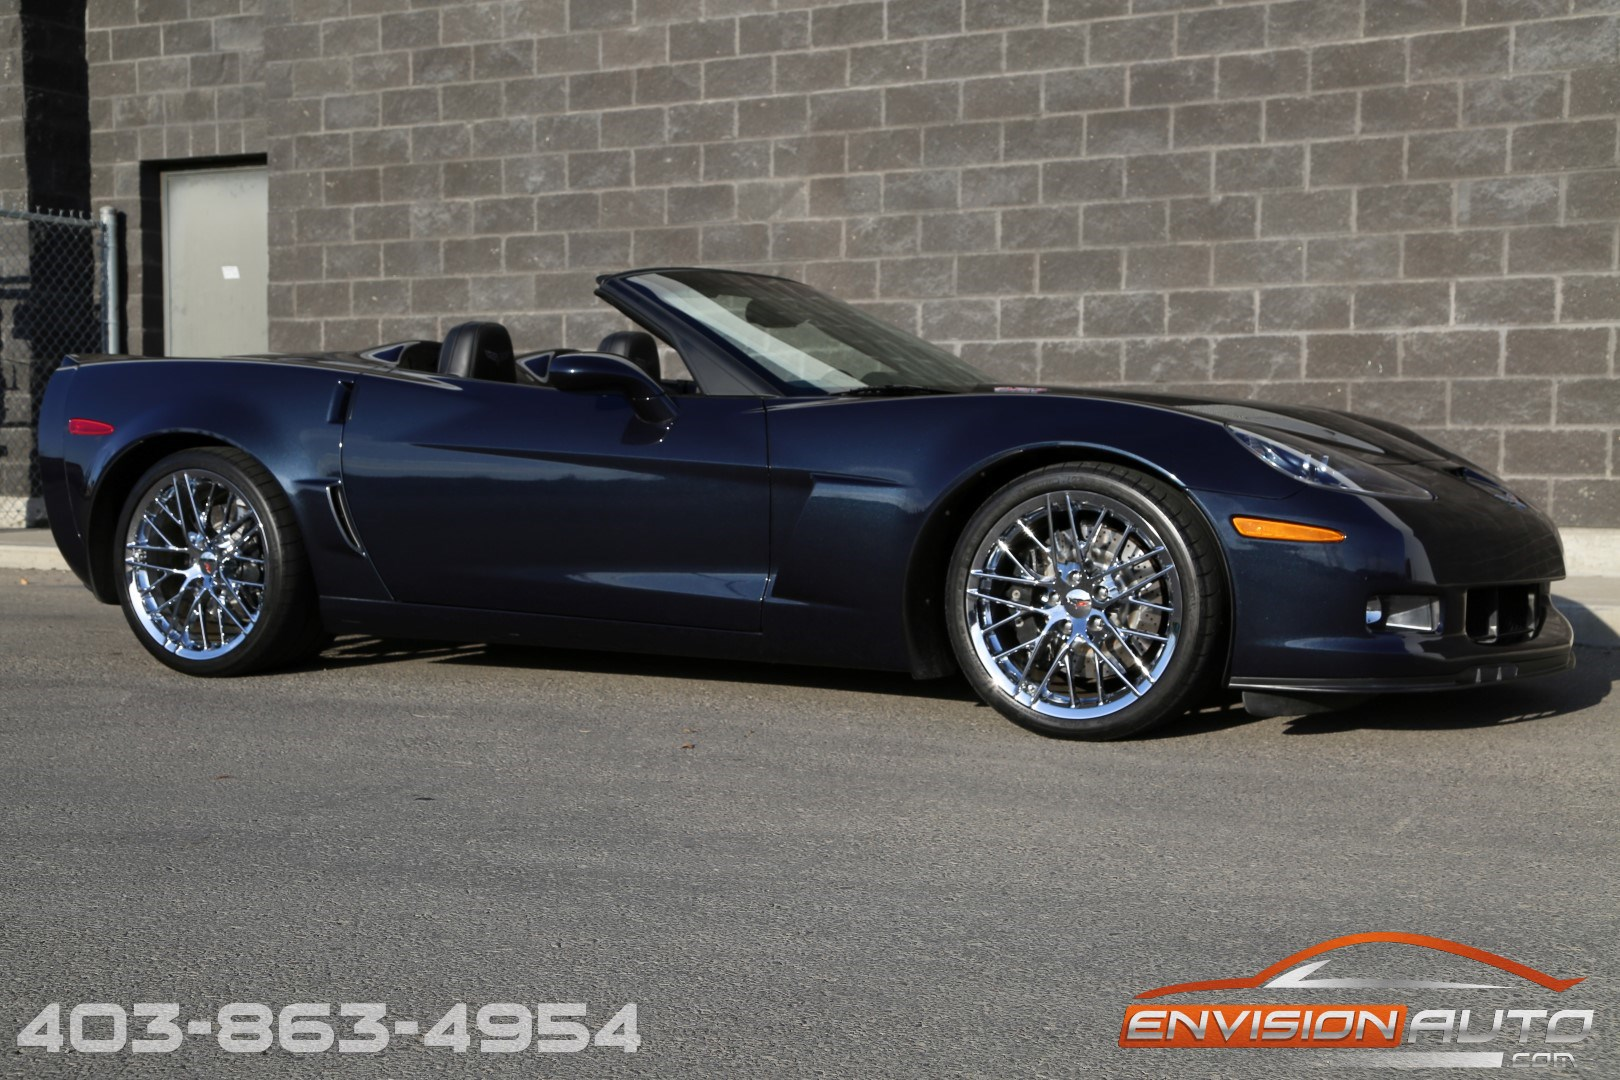 2013 chevrolet corvette 427 convertible 7 0l v8 ls7 envision auto. Black Bedroom Furniture Sets. Home Design Ideas